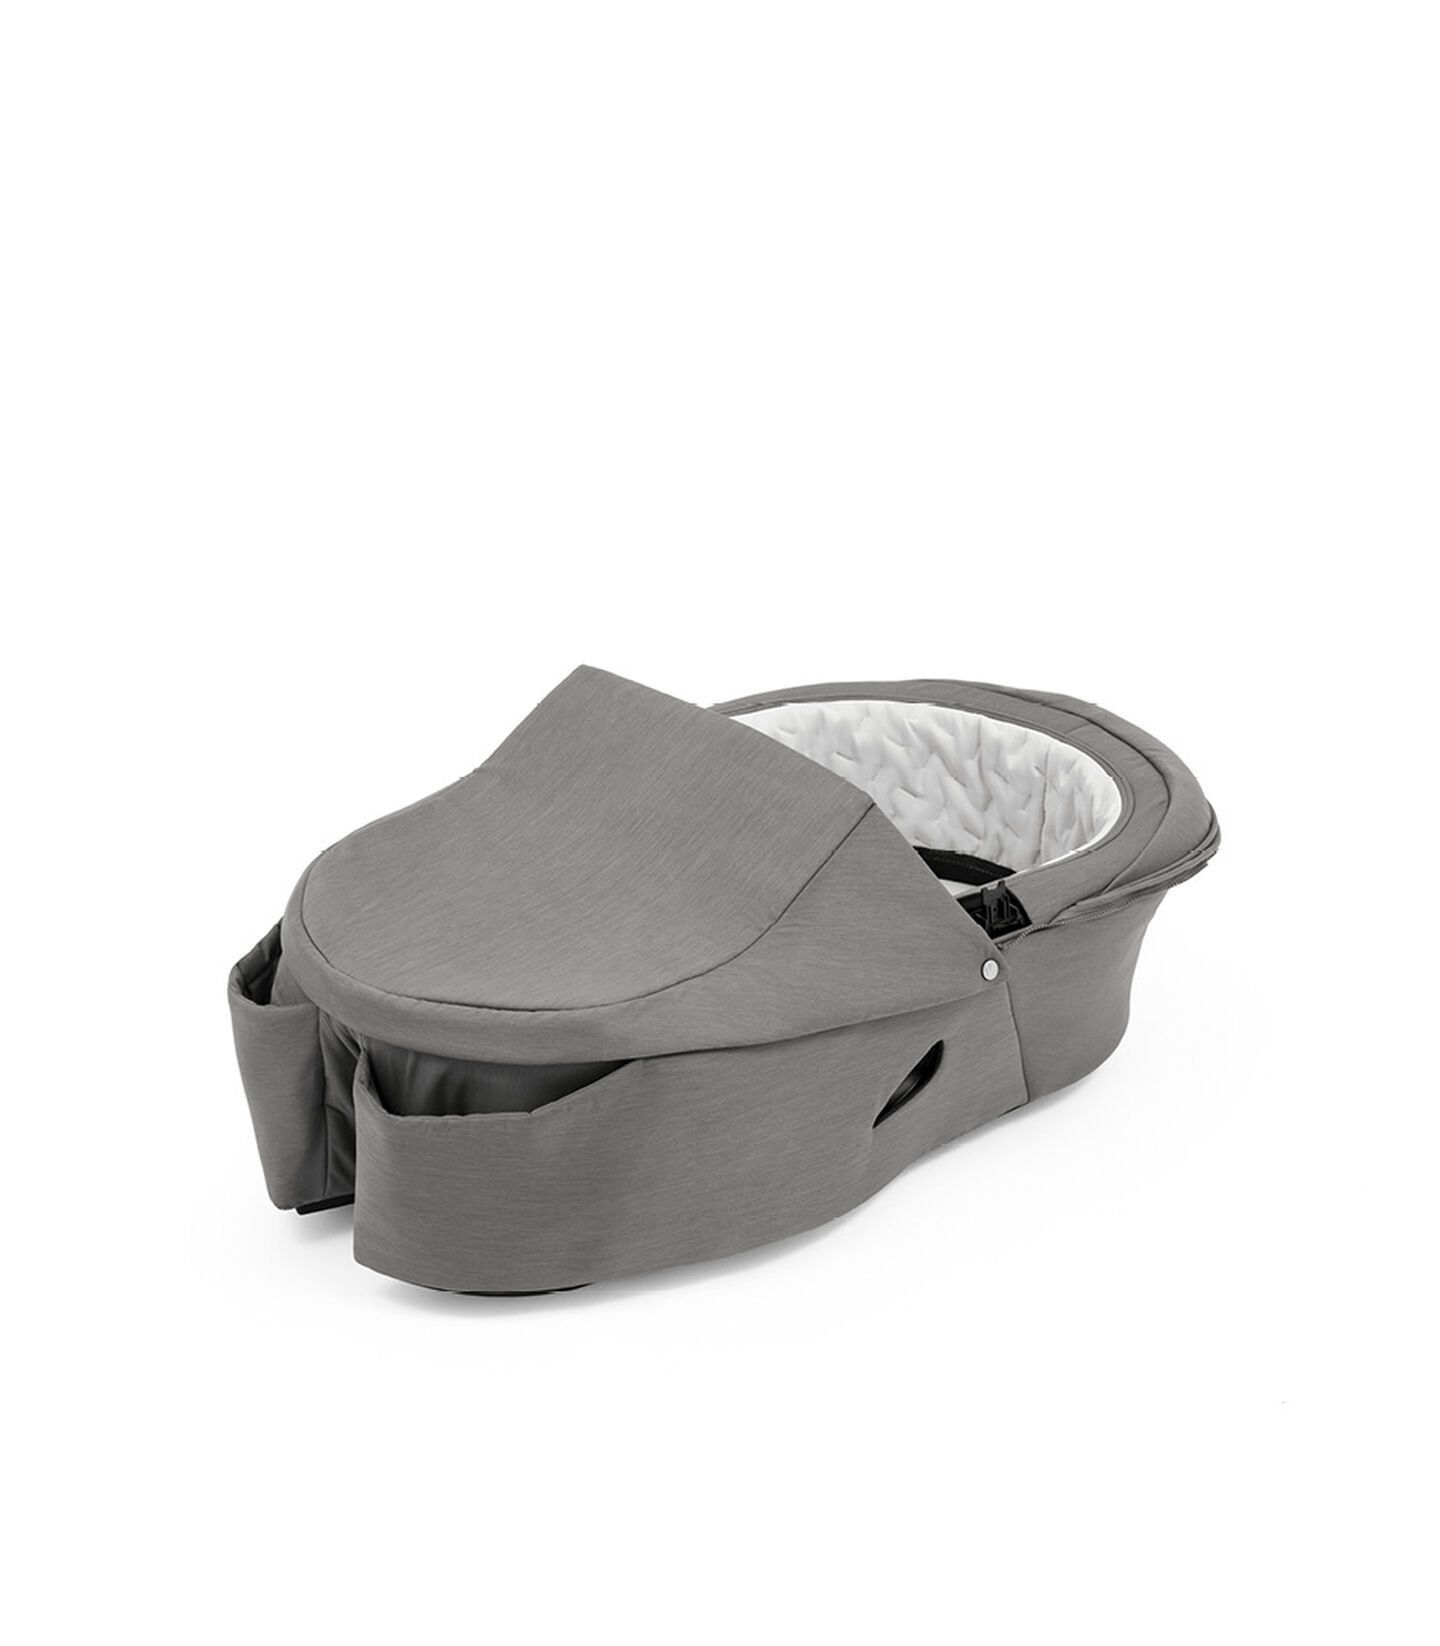 Stokke® Xplory® X Babyschale Modern Grey, Modern Grey, mainview view 1